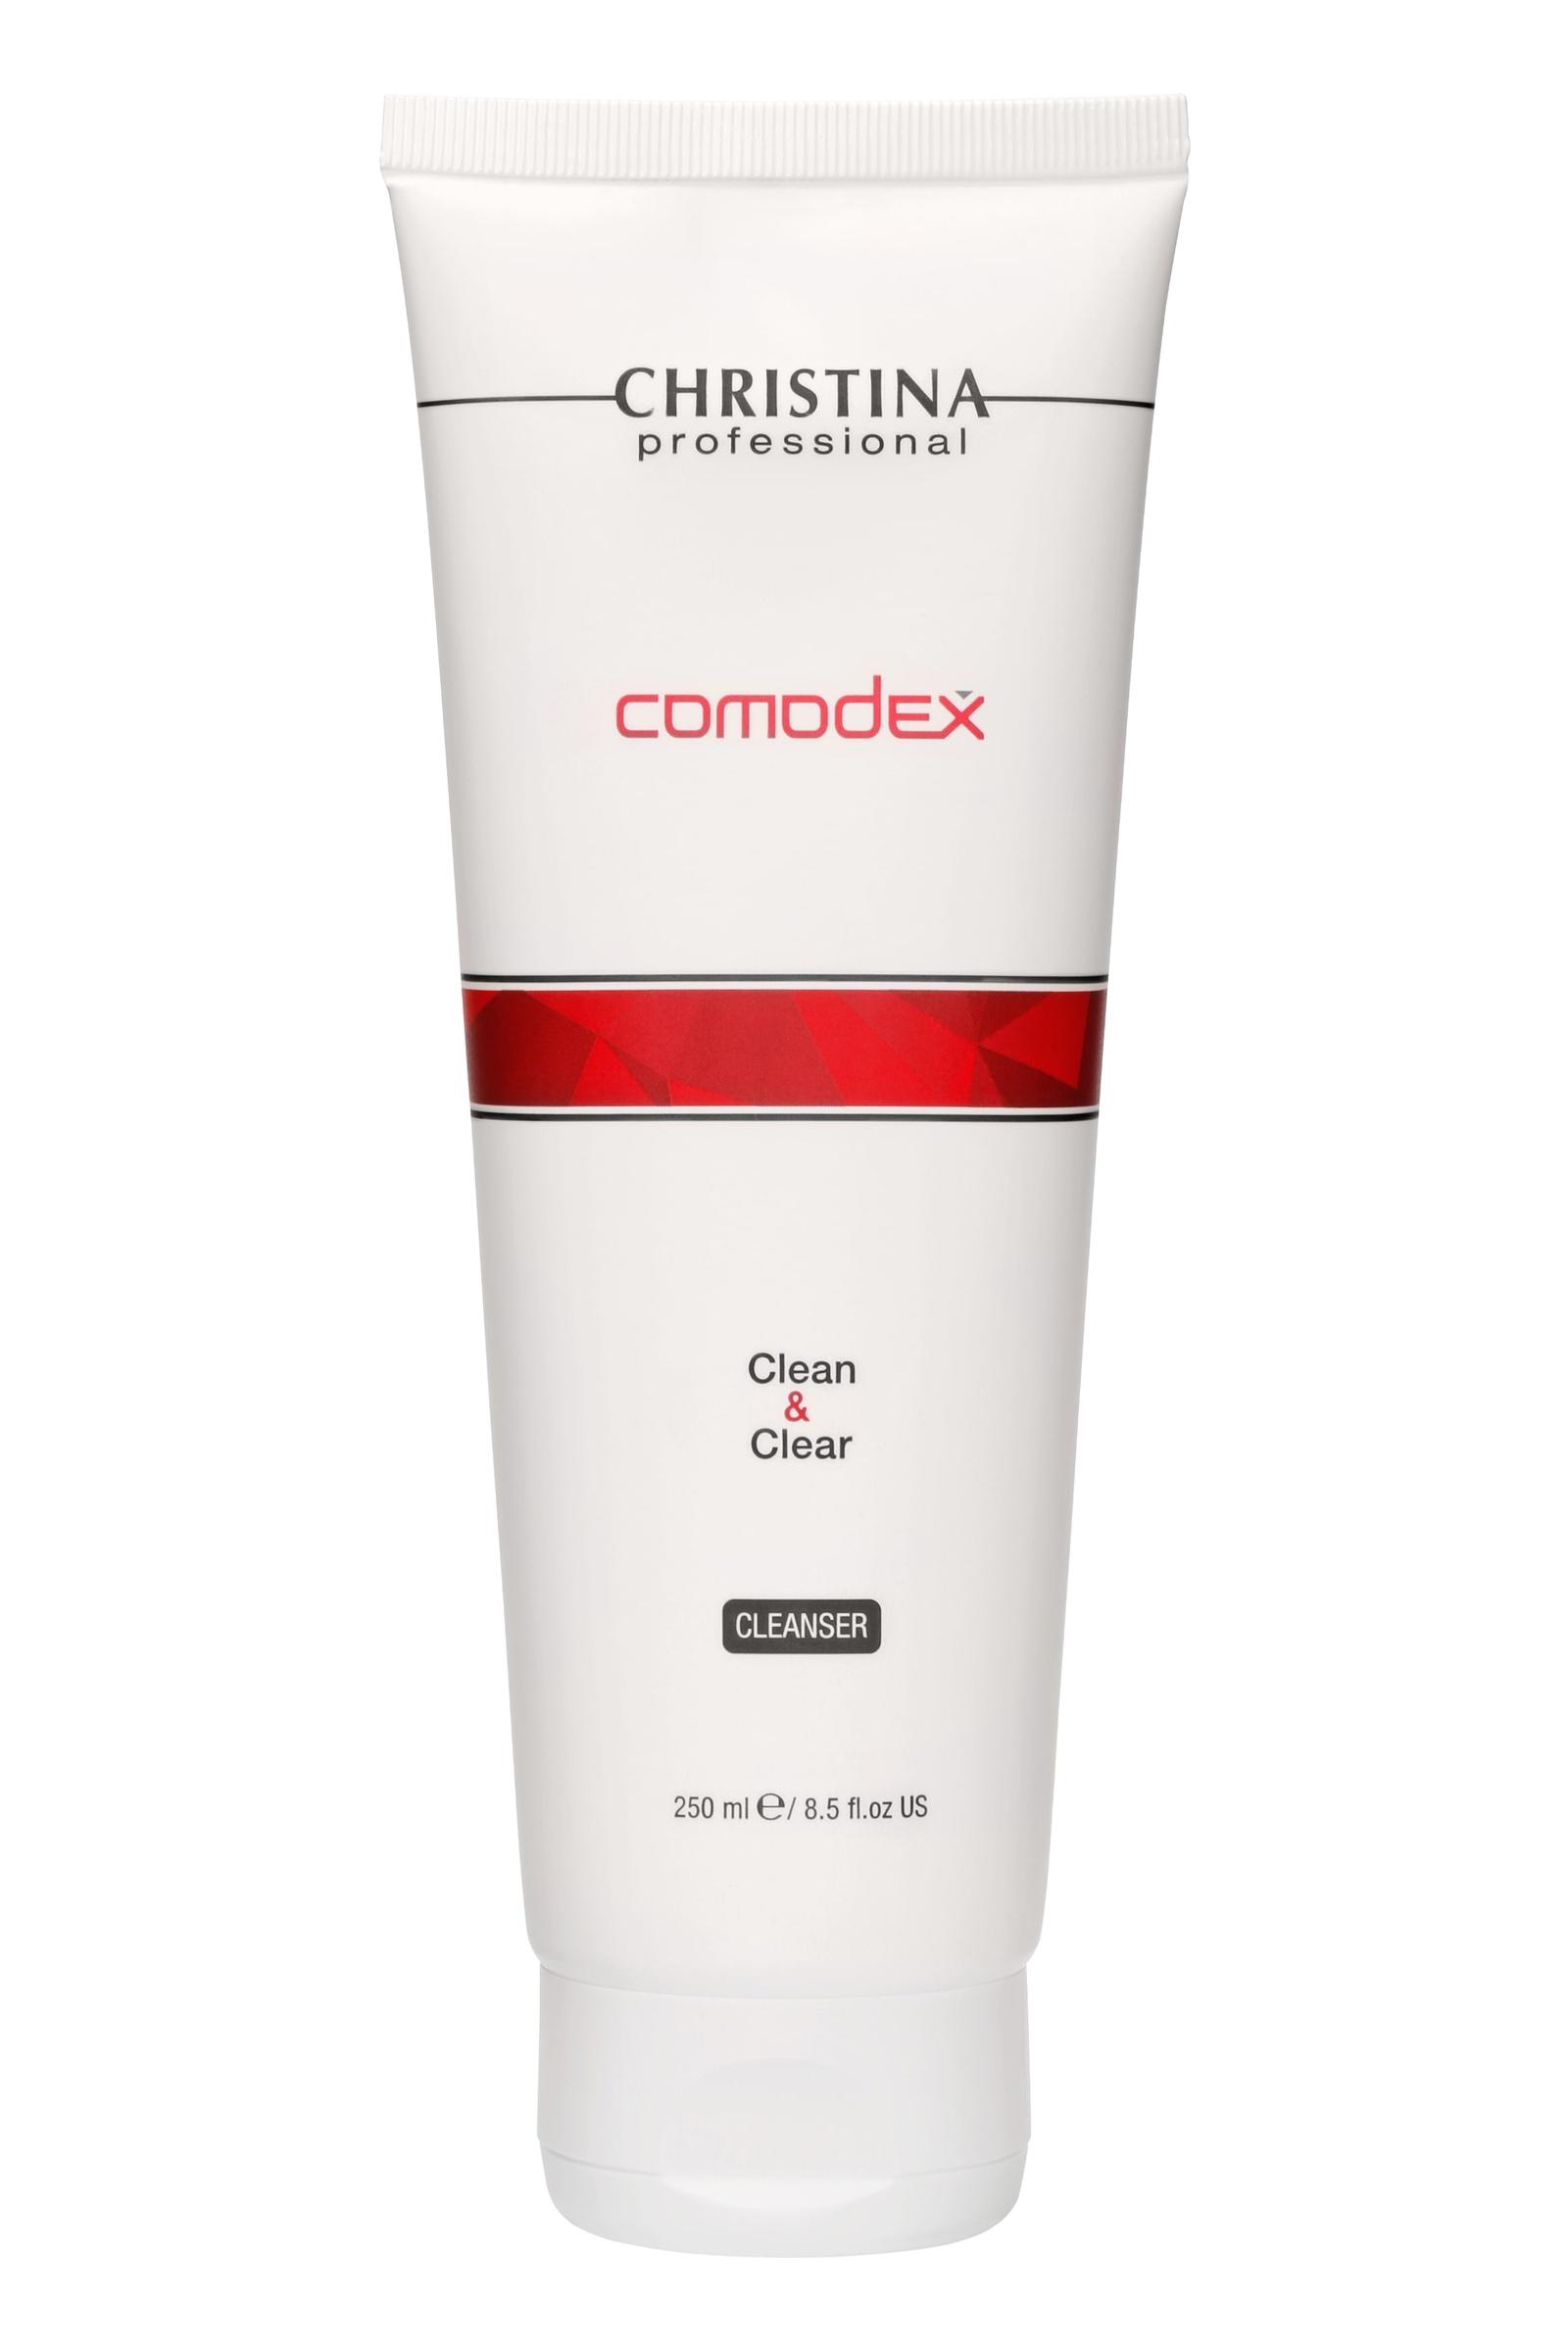 Гель для умывания CHRISTINA Очищающий Comodex Clean & Clear Cleanser